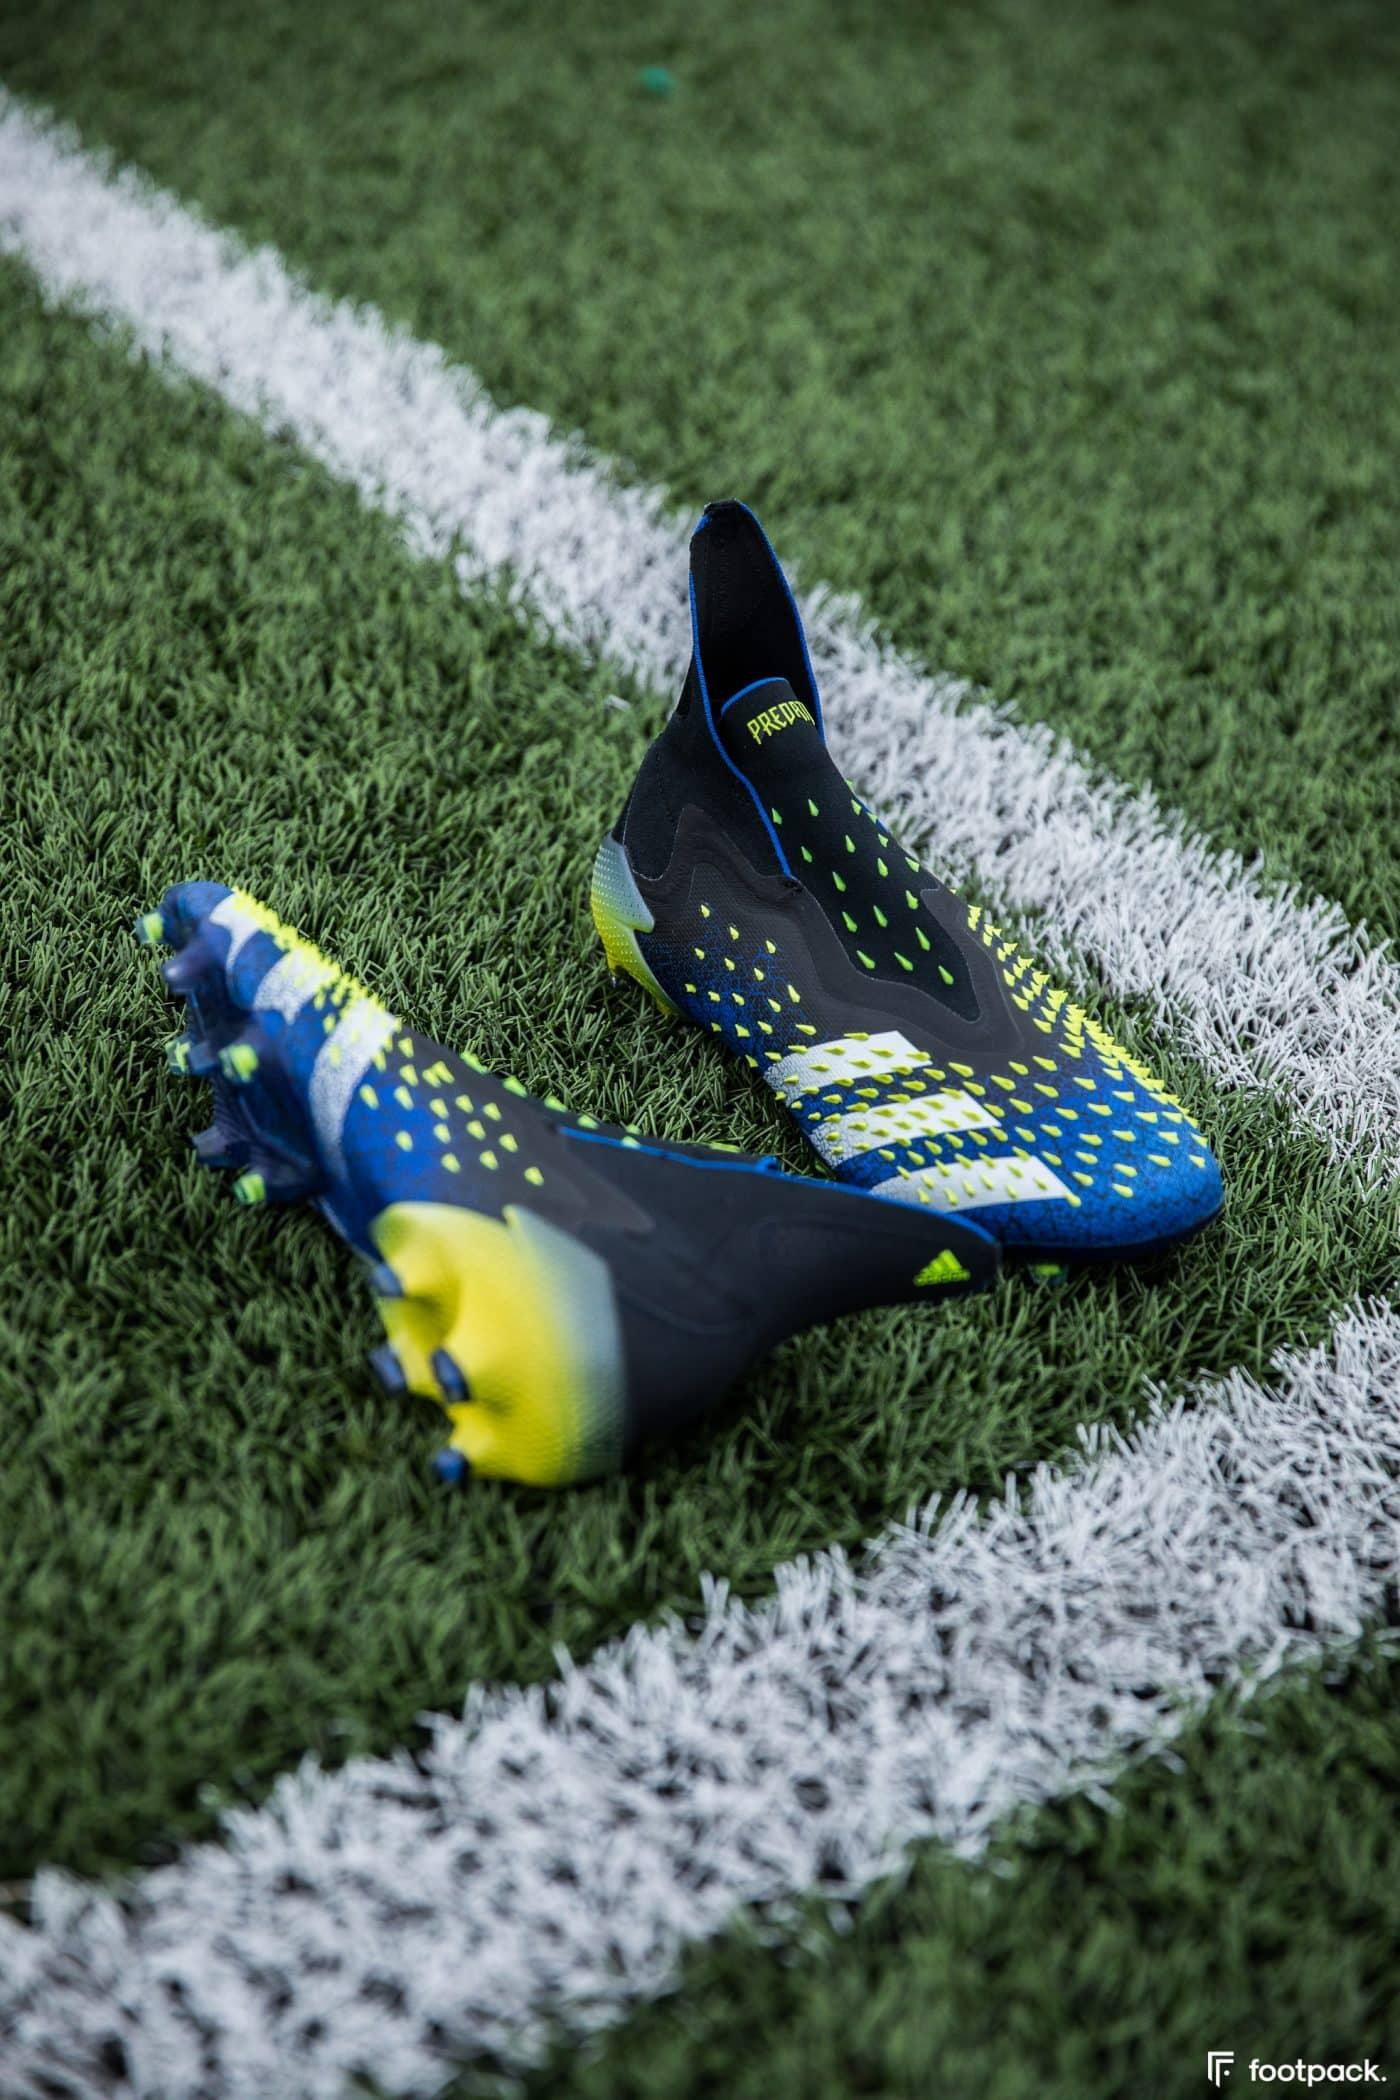 adidas-predator-freak-superlative-footpack-5